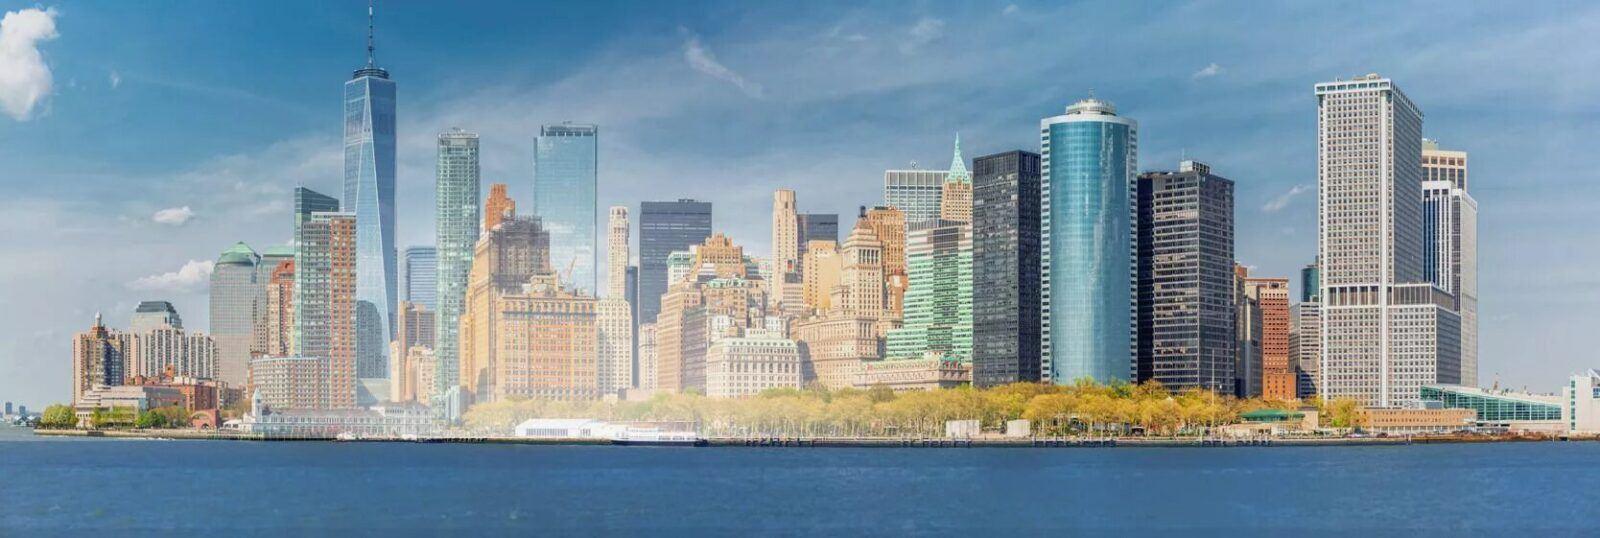 Brian D. Perskin & Associates P.C. of New York